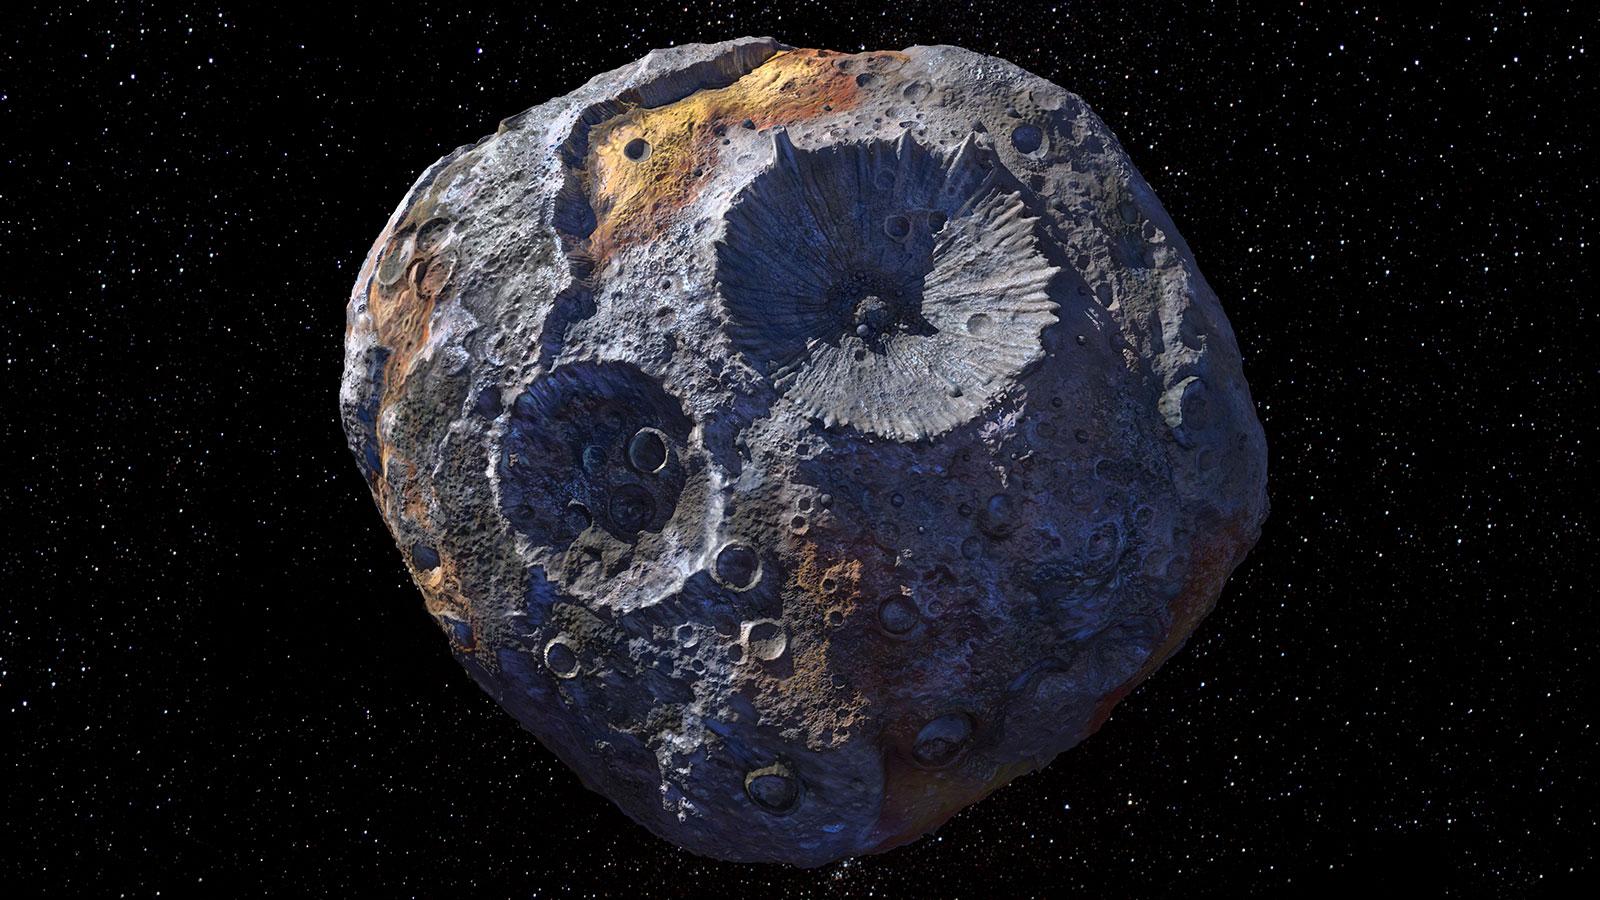 Обои обломки, астероиды, земля. Космос foto 19